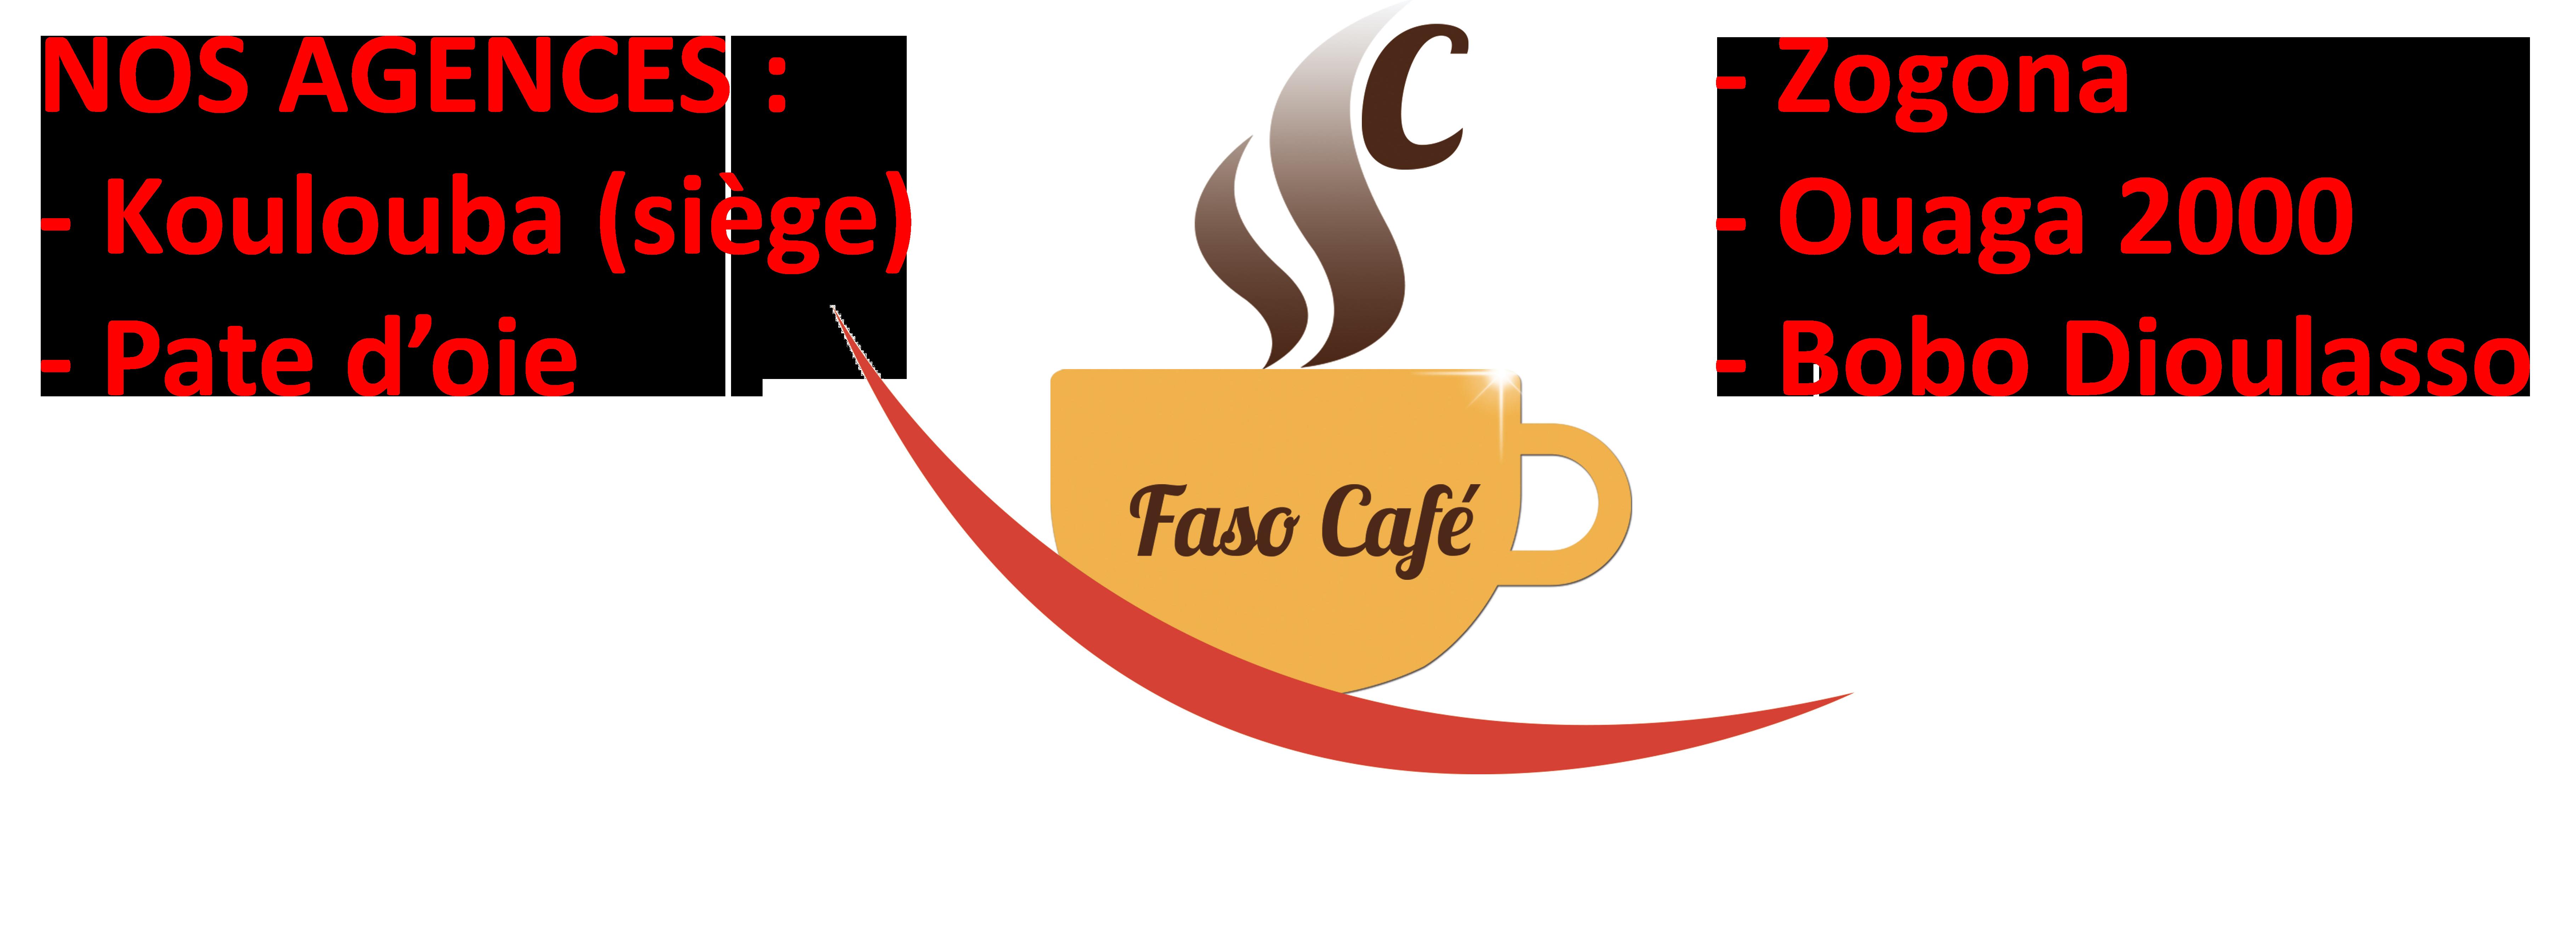 Faso Café